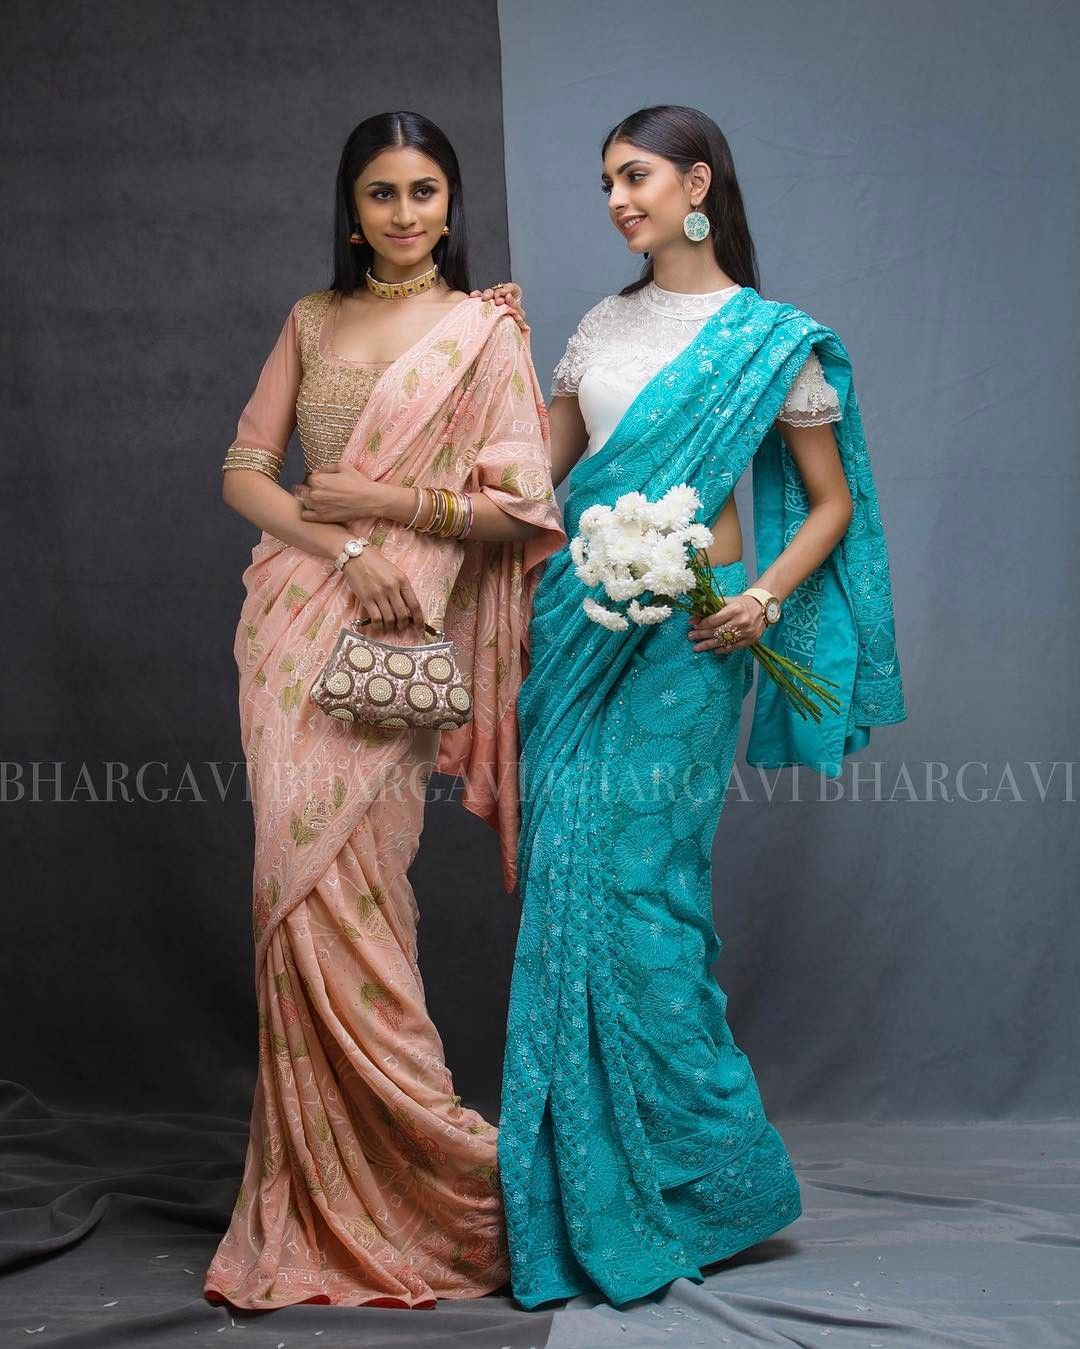 11 Designer Saree Ideas To Pick For Wedding Reception Parties Saree Designs Traditional Fashion Indian Dresses